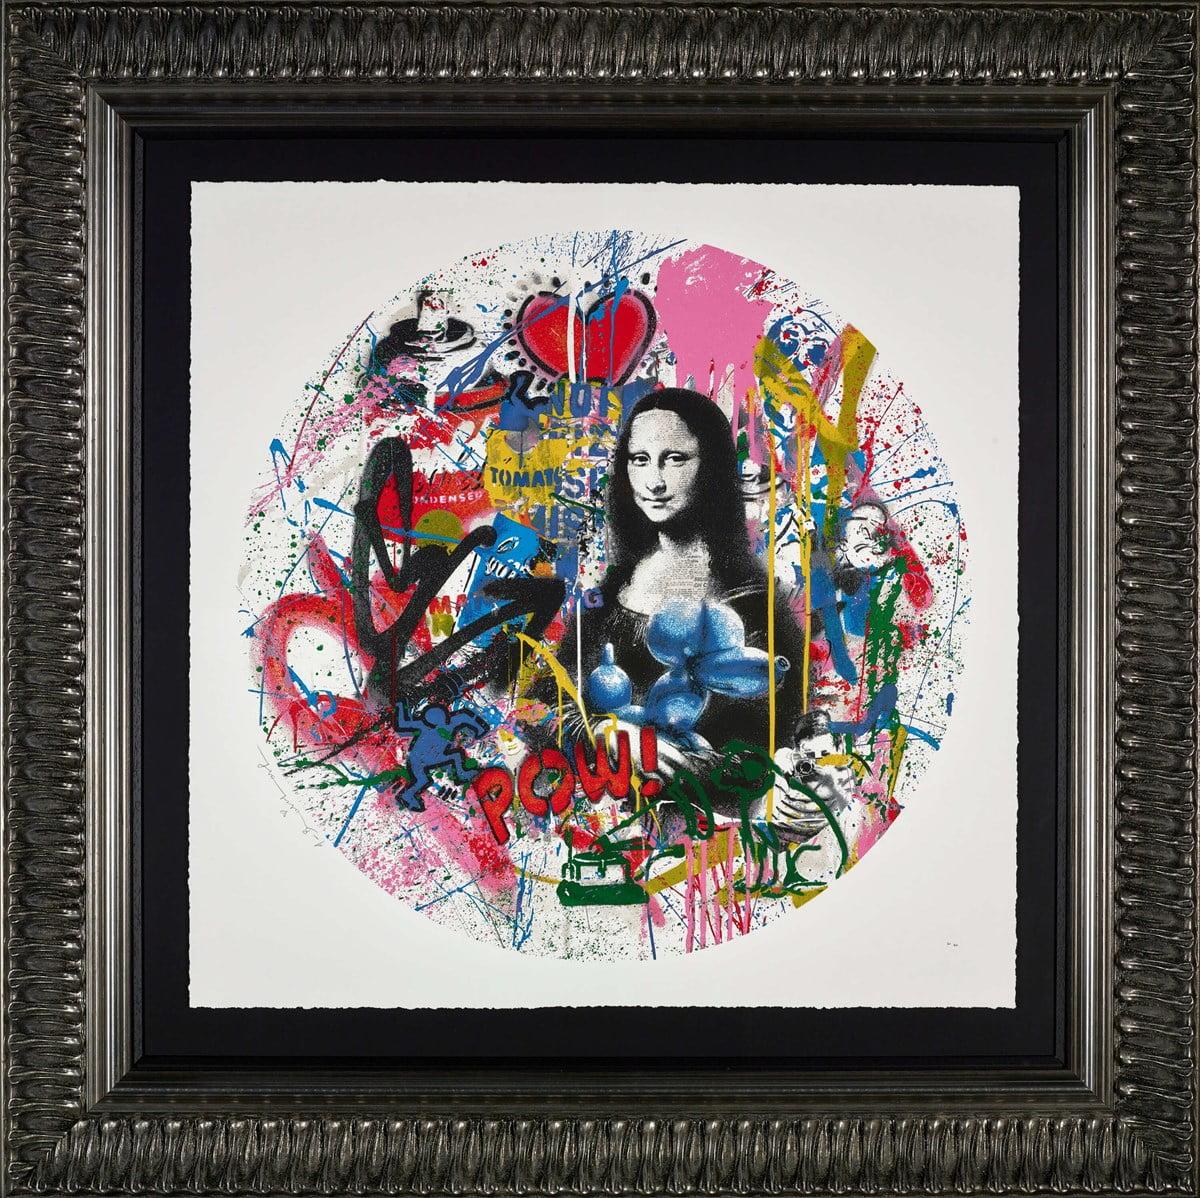 Roundabout - Mona Lisa ~ Mr Brainwash